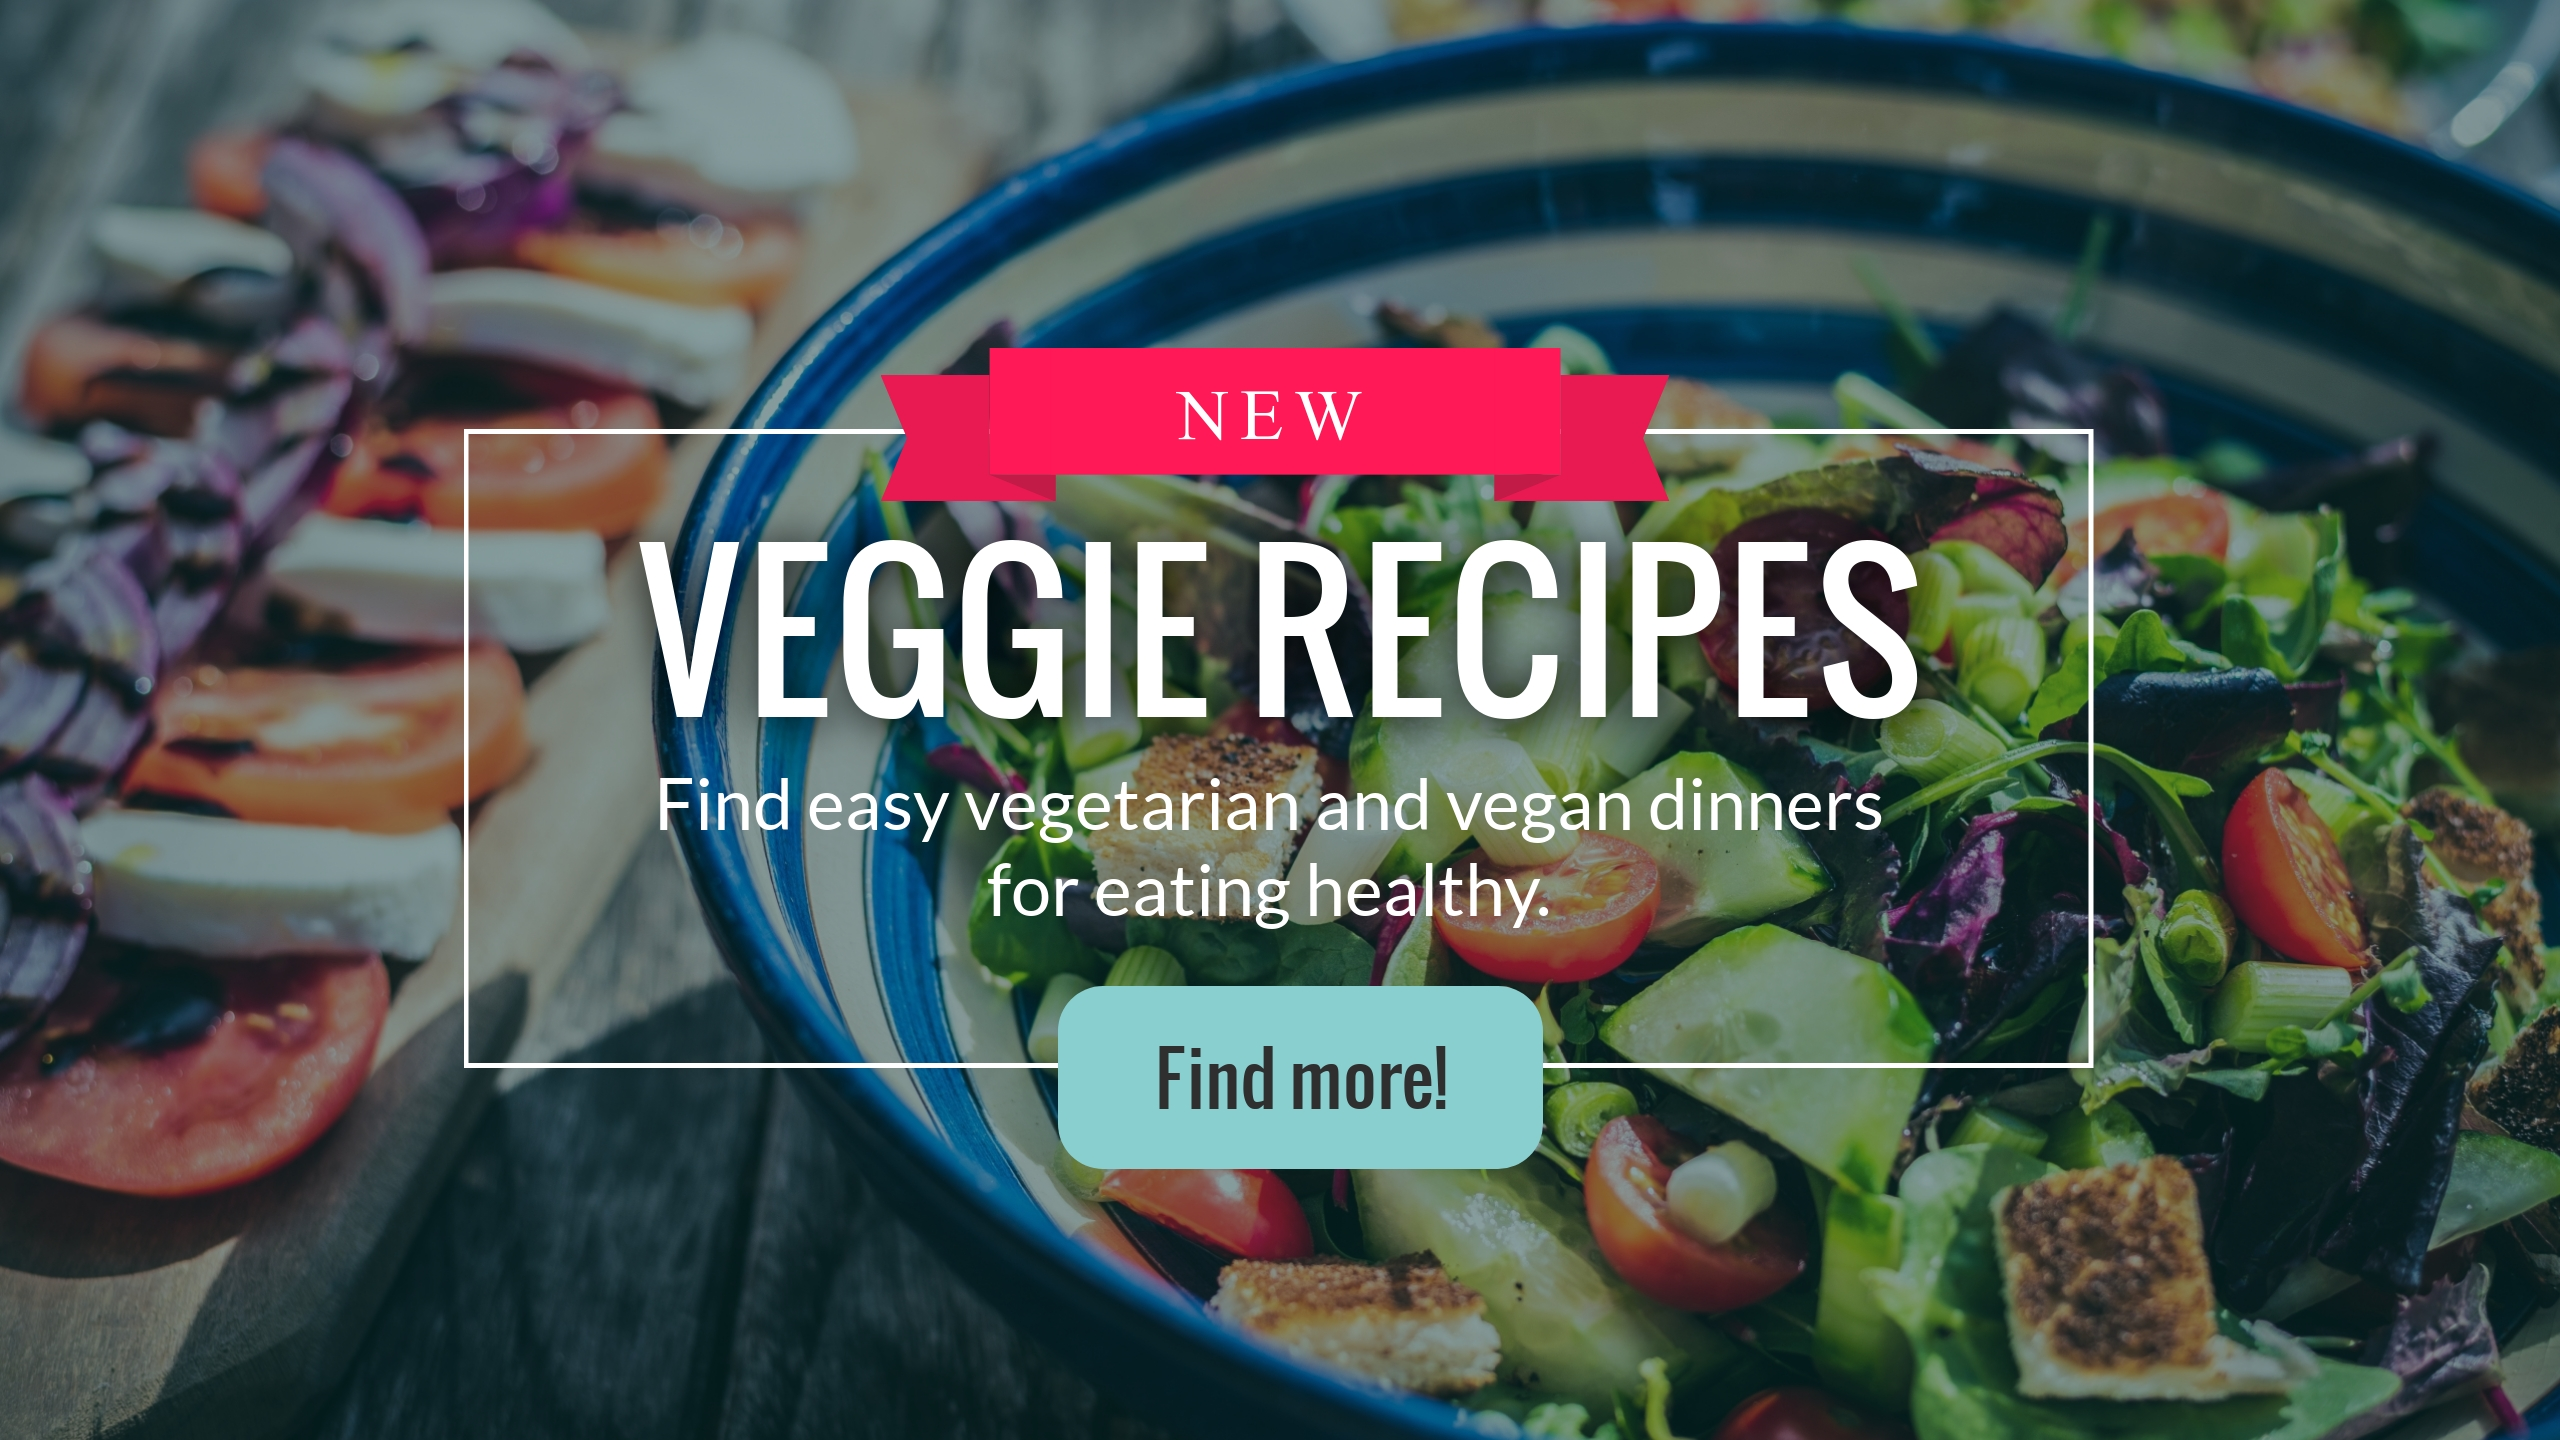 Veggie Recipes Youtube Channel Art Template